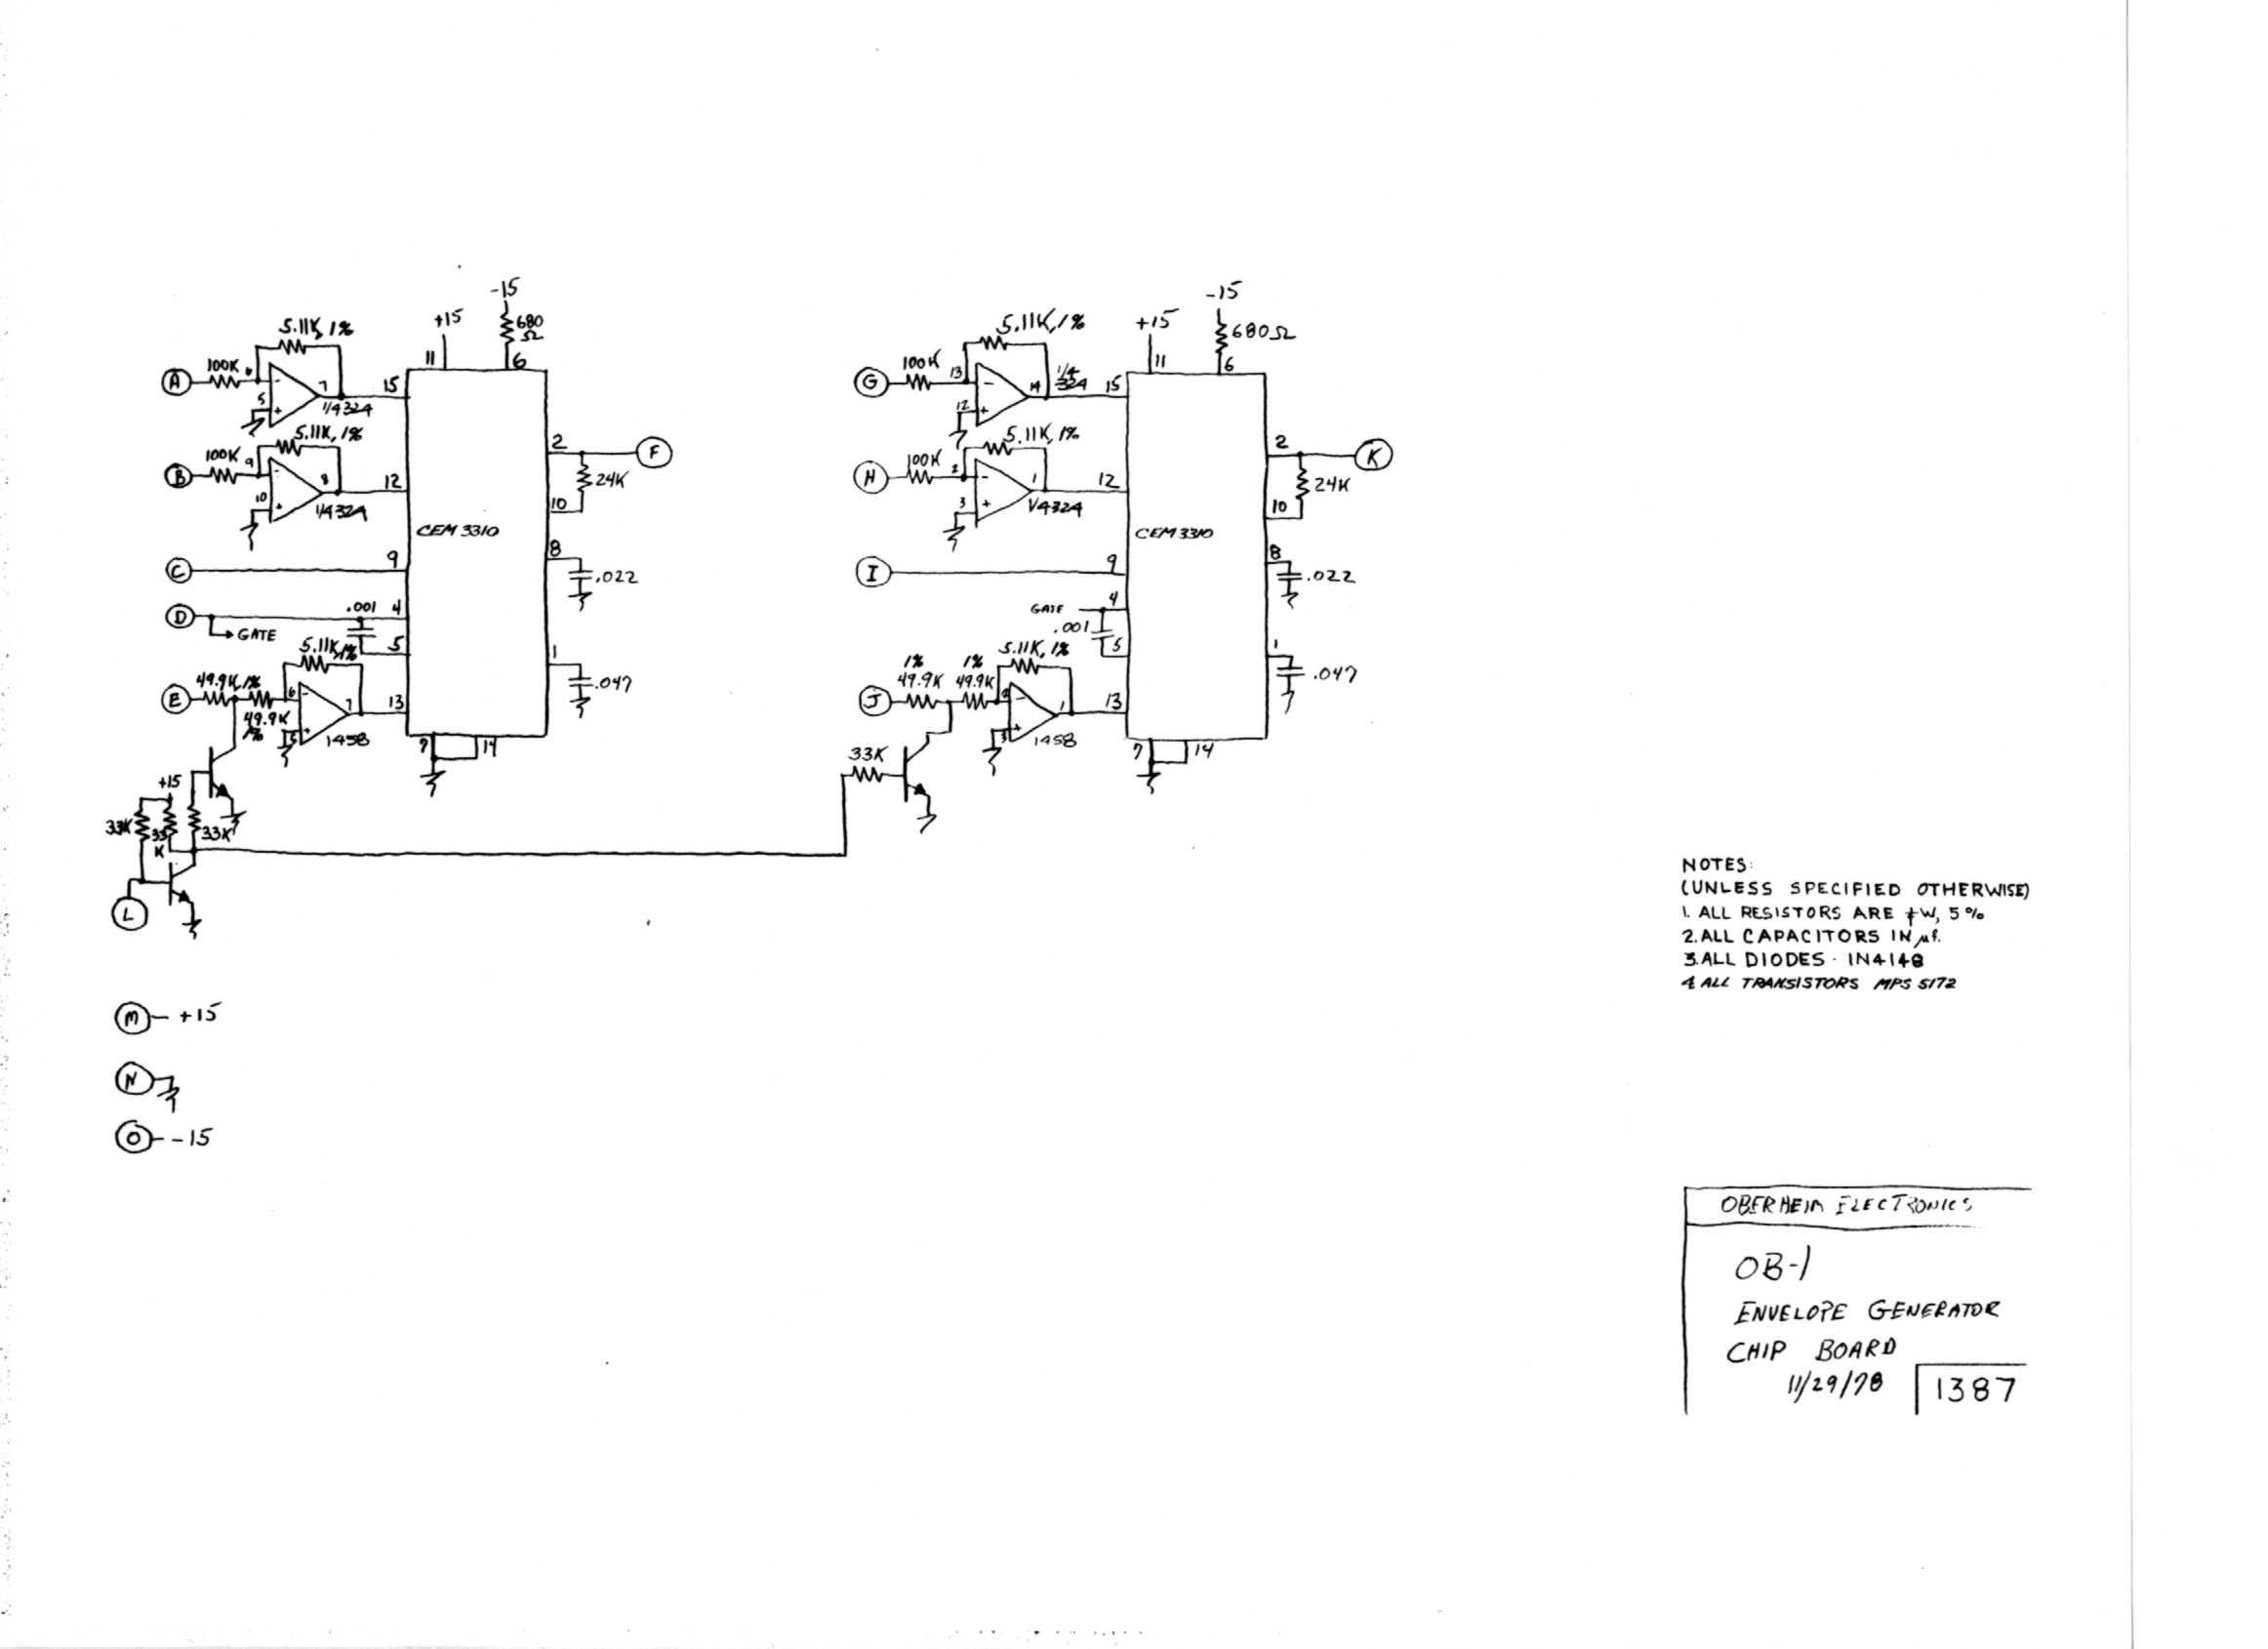 schematic · ob-1 envelope generator chip board